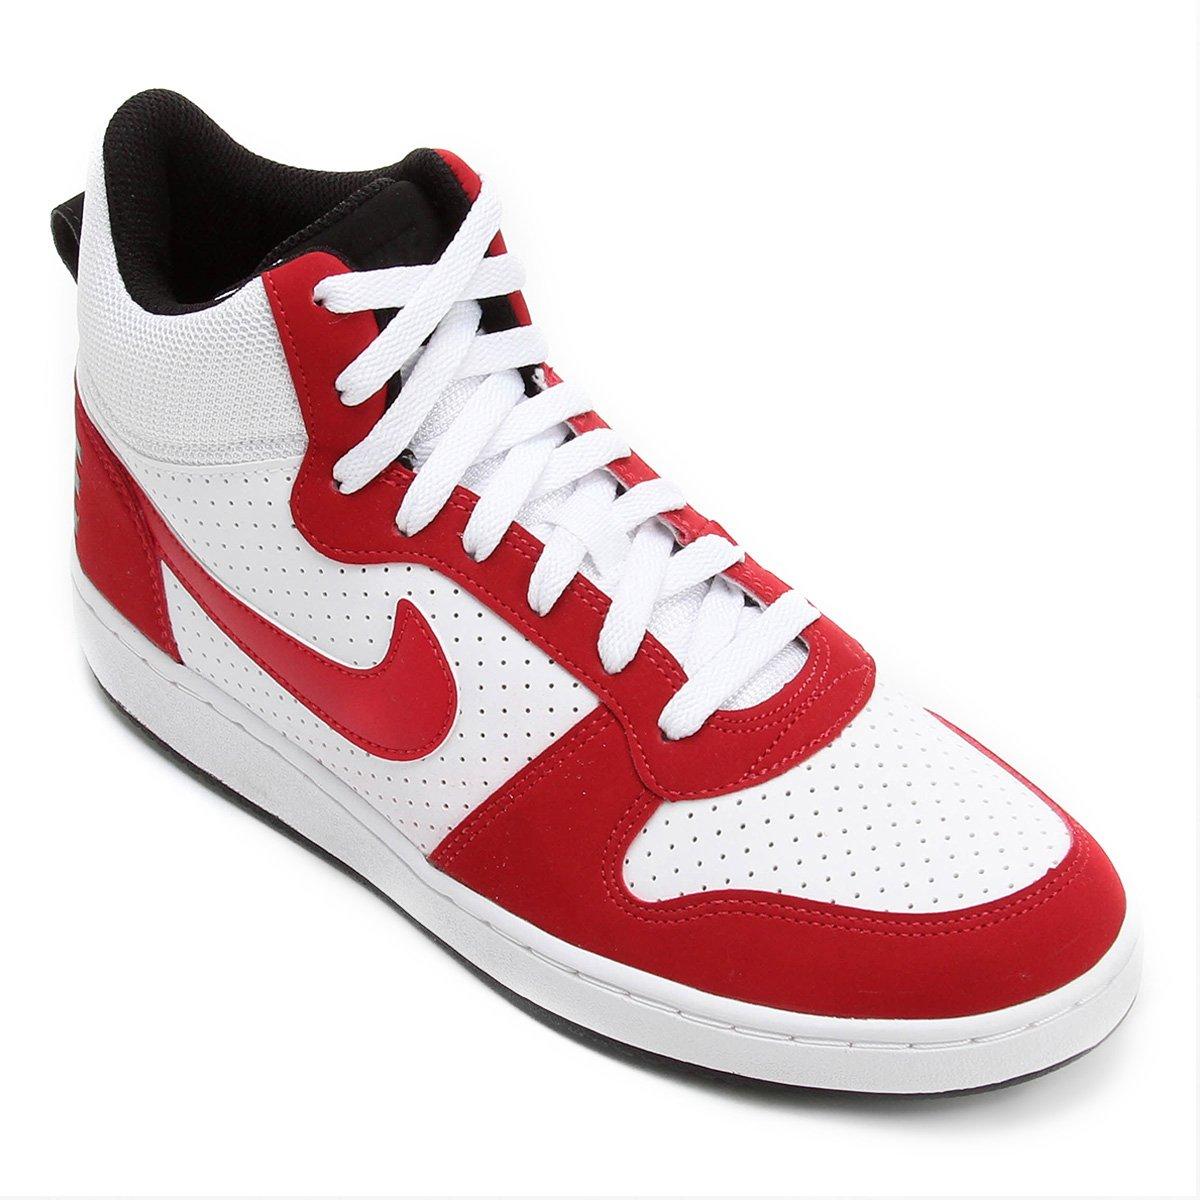 e0b293c03 Tênis Couro Cano Alto Nike Recreation Mid Masculino - Compre Agora ...